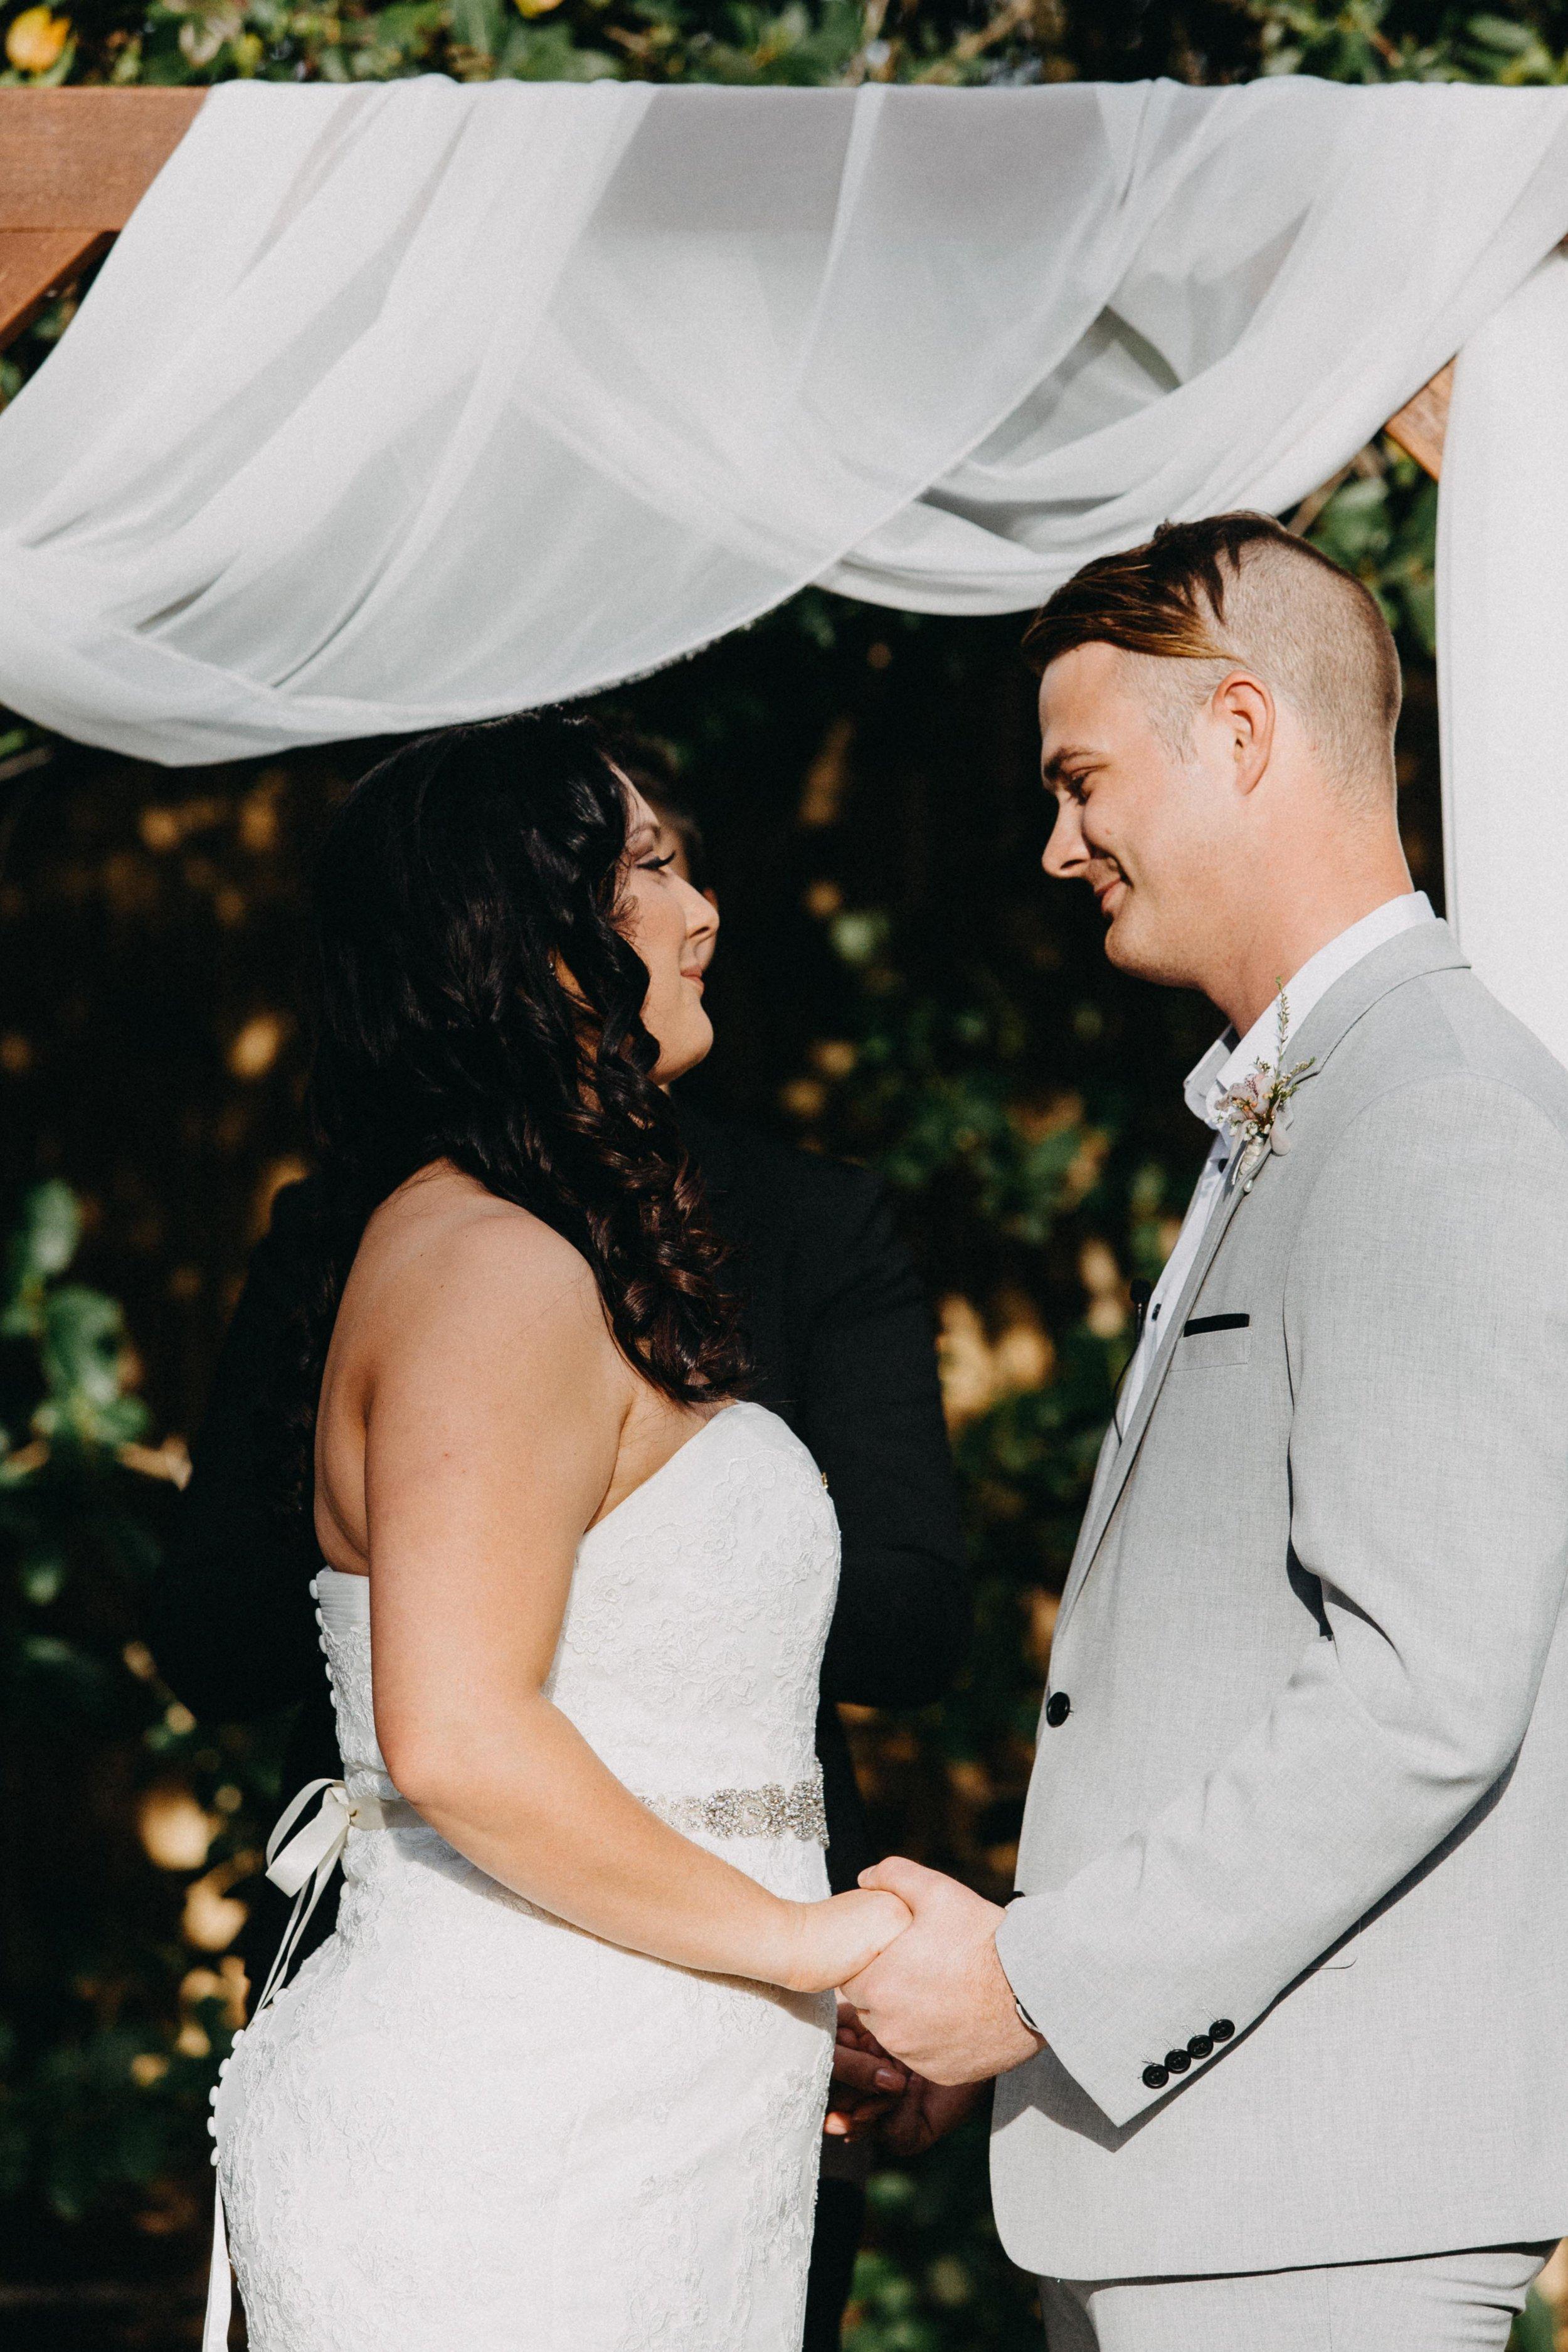 burnham-grove-camden-wedding-emilyobrienphotography-macarthur-64.jpg